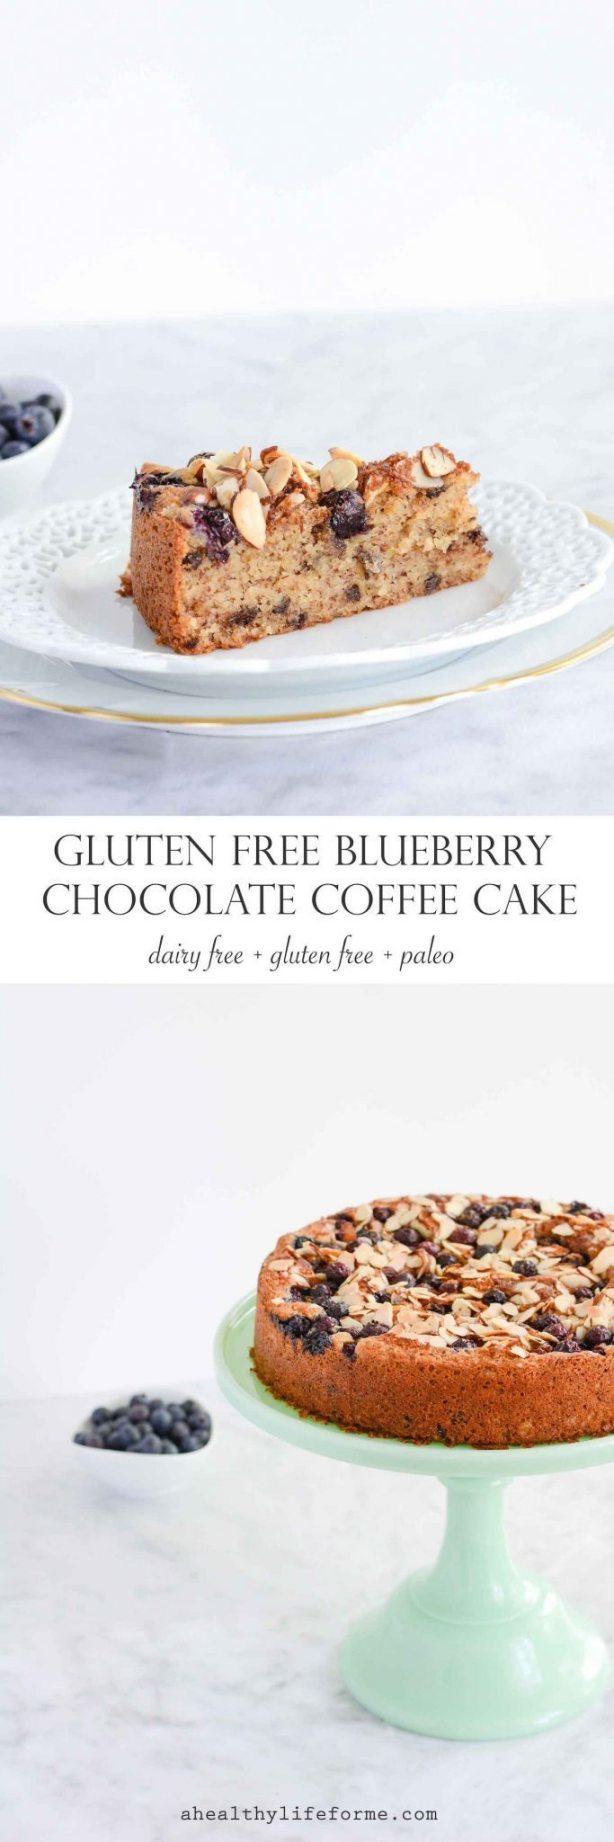 Gluten Free Blueberry Chocolate Cake | ahealhtylifeforme.com